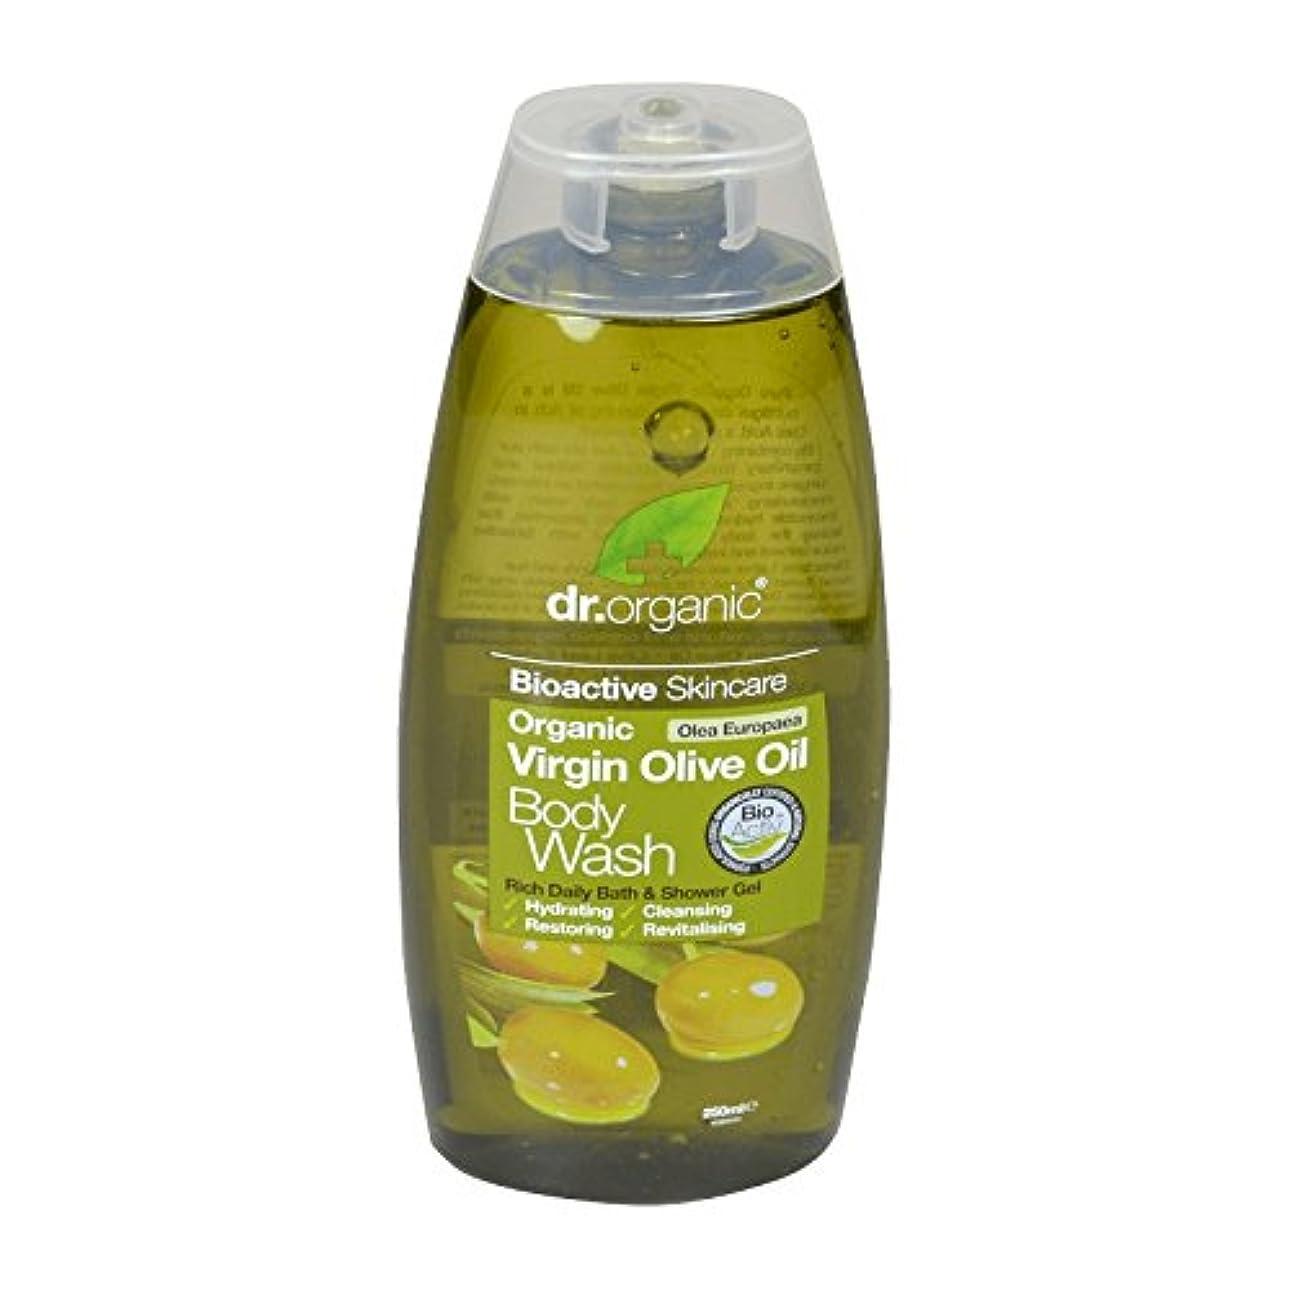 Dr Organic Virgin Olive Oil Body Wash (Pack of 2) - Dr有機バージンオリーブオイルボディウォッシュ (x2) [並行輸入品]